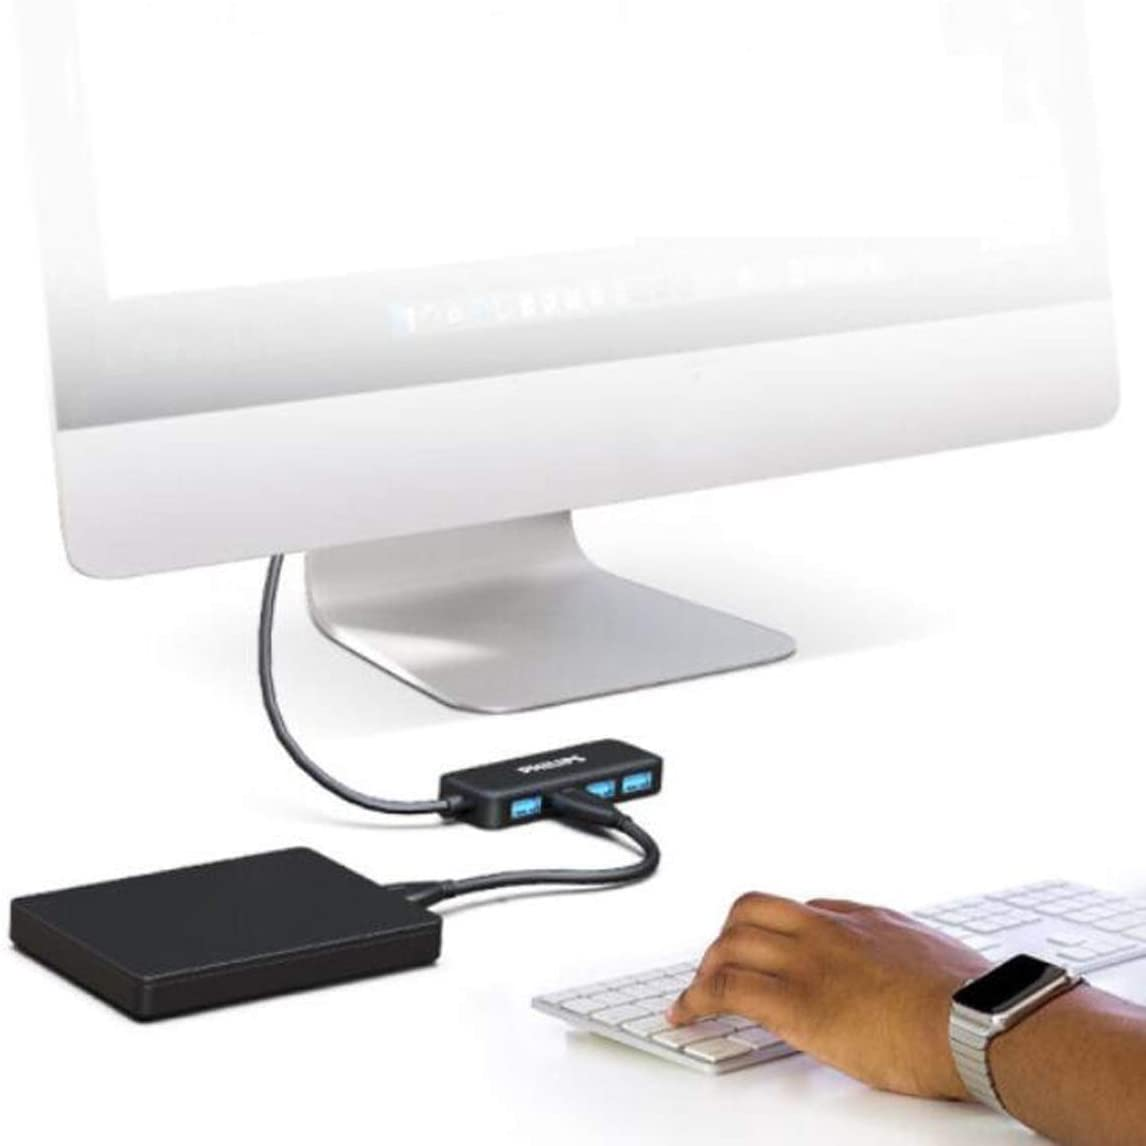 USB Splitter 3.0 High Speed Transmission Hub Hub Color : Black, Size : 0.2 m Line Length 20 cm Scratchproof Youshangshipin Hub